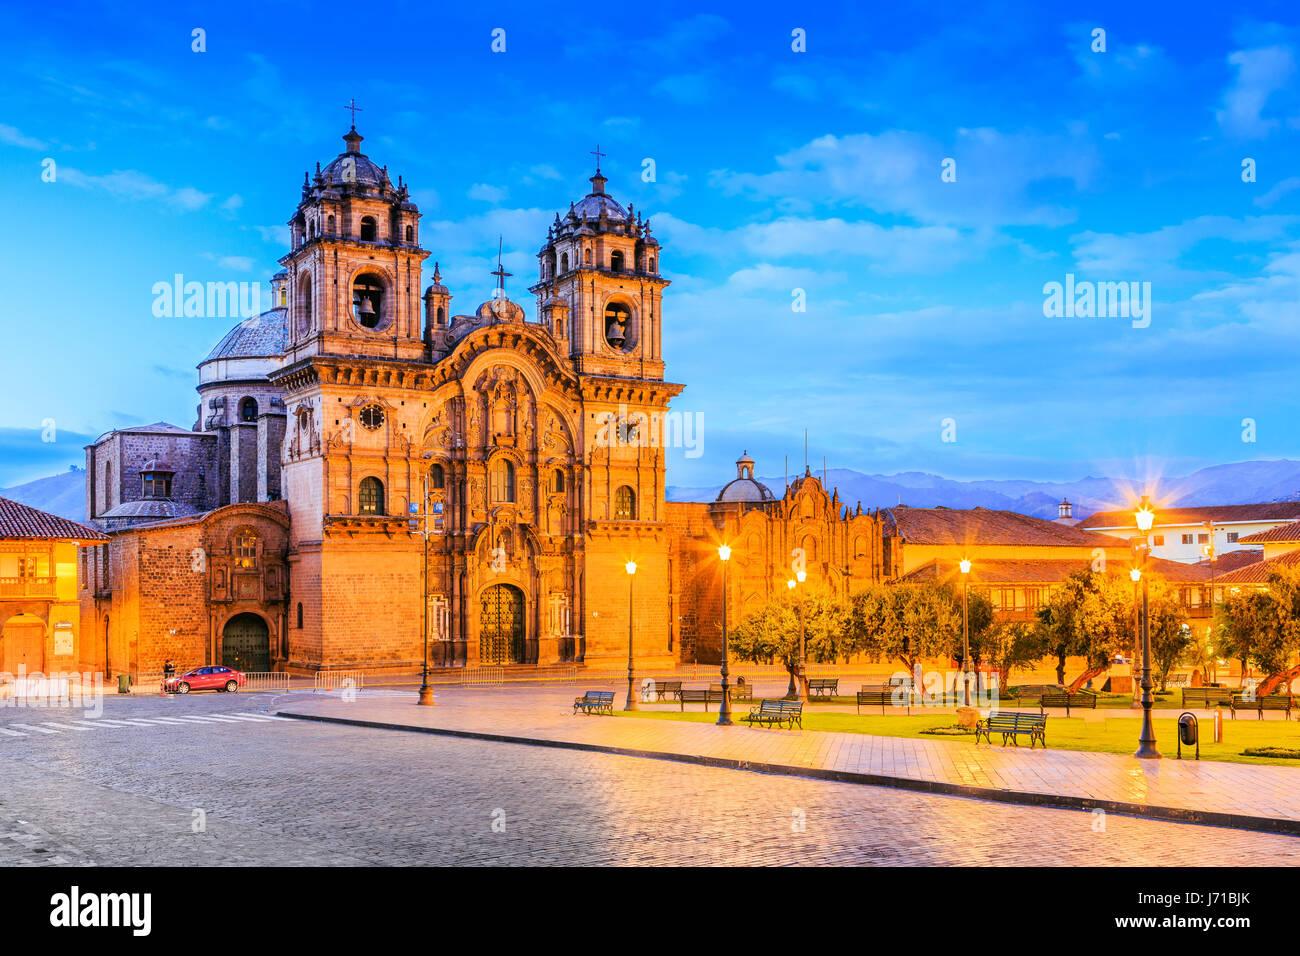 Cusco, Peru the historic capital of the Inca Empire. Plaza de Armas at twilight. - Stock Image